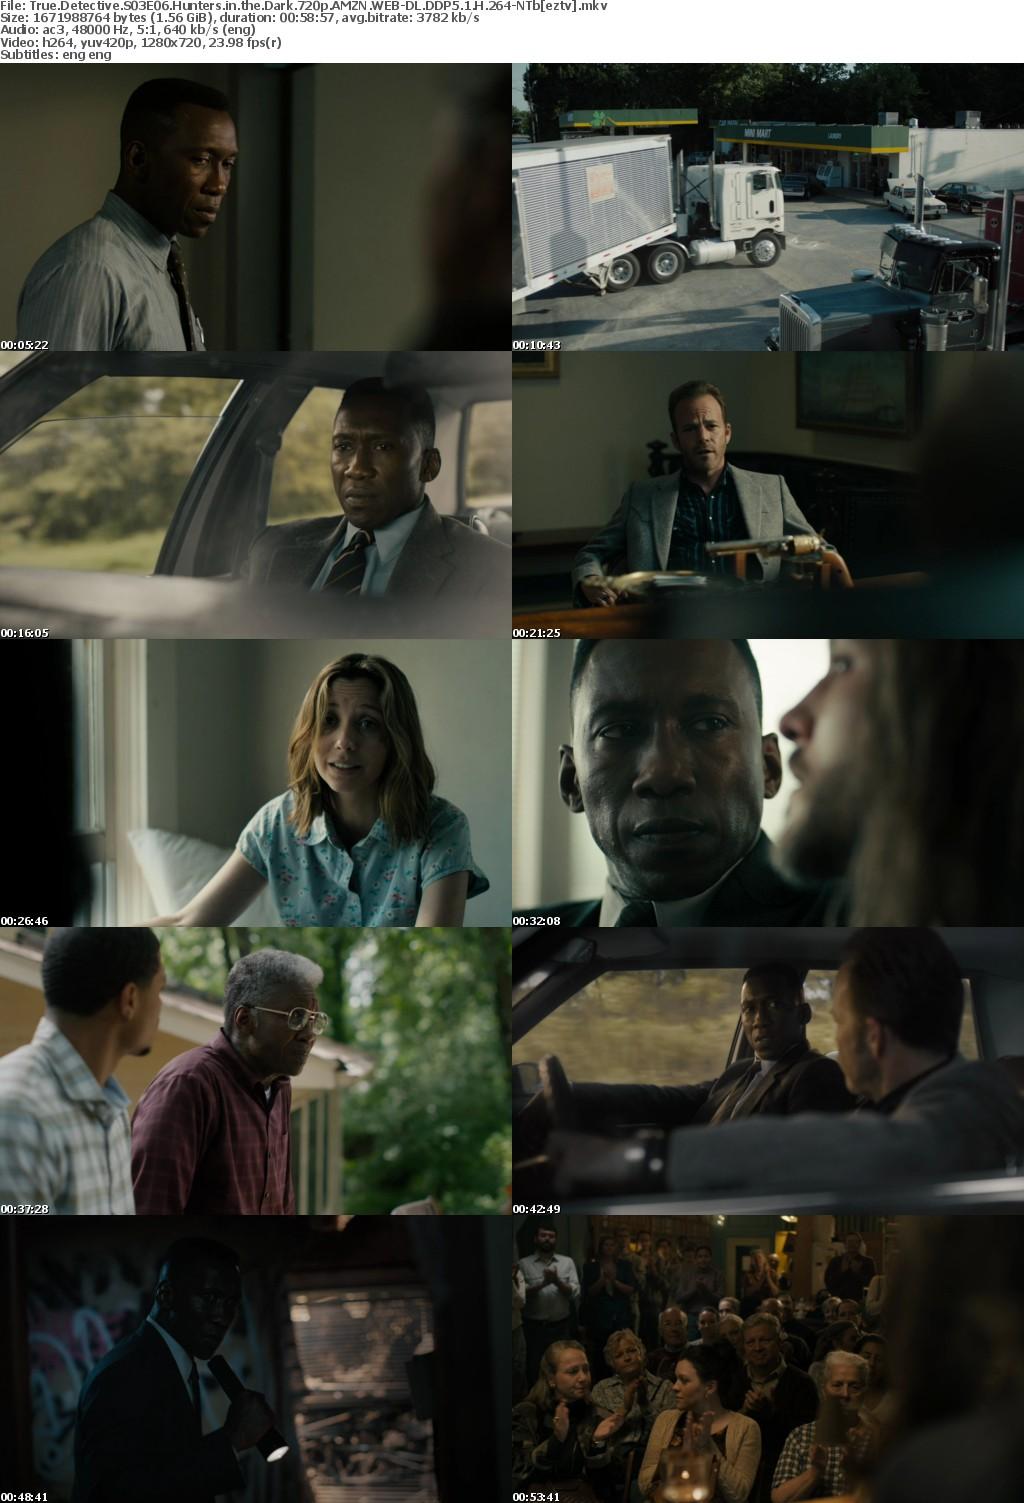 True Detective S03E06 Hunters in the Dark 720p AMZN WEB-DL DDP5 1 H 264-NTb